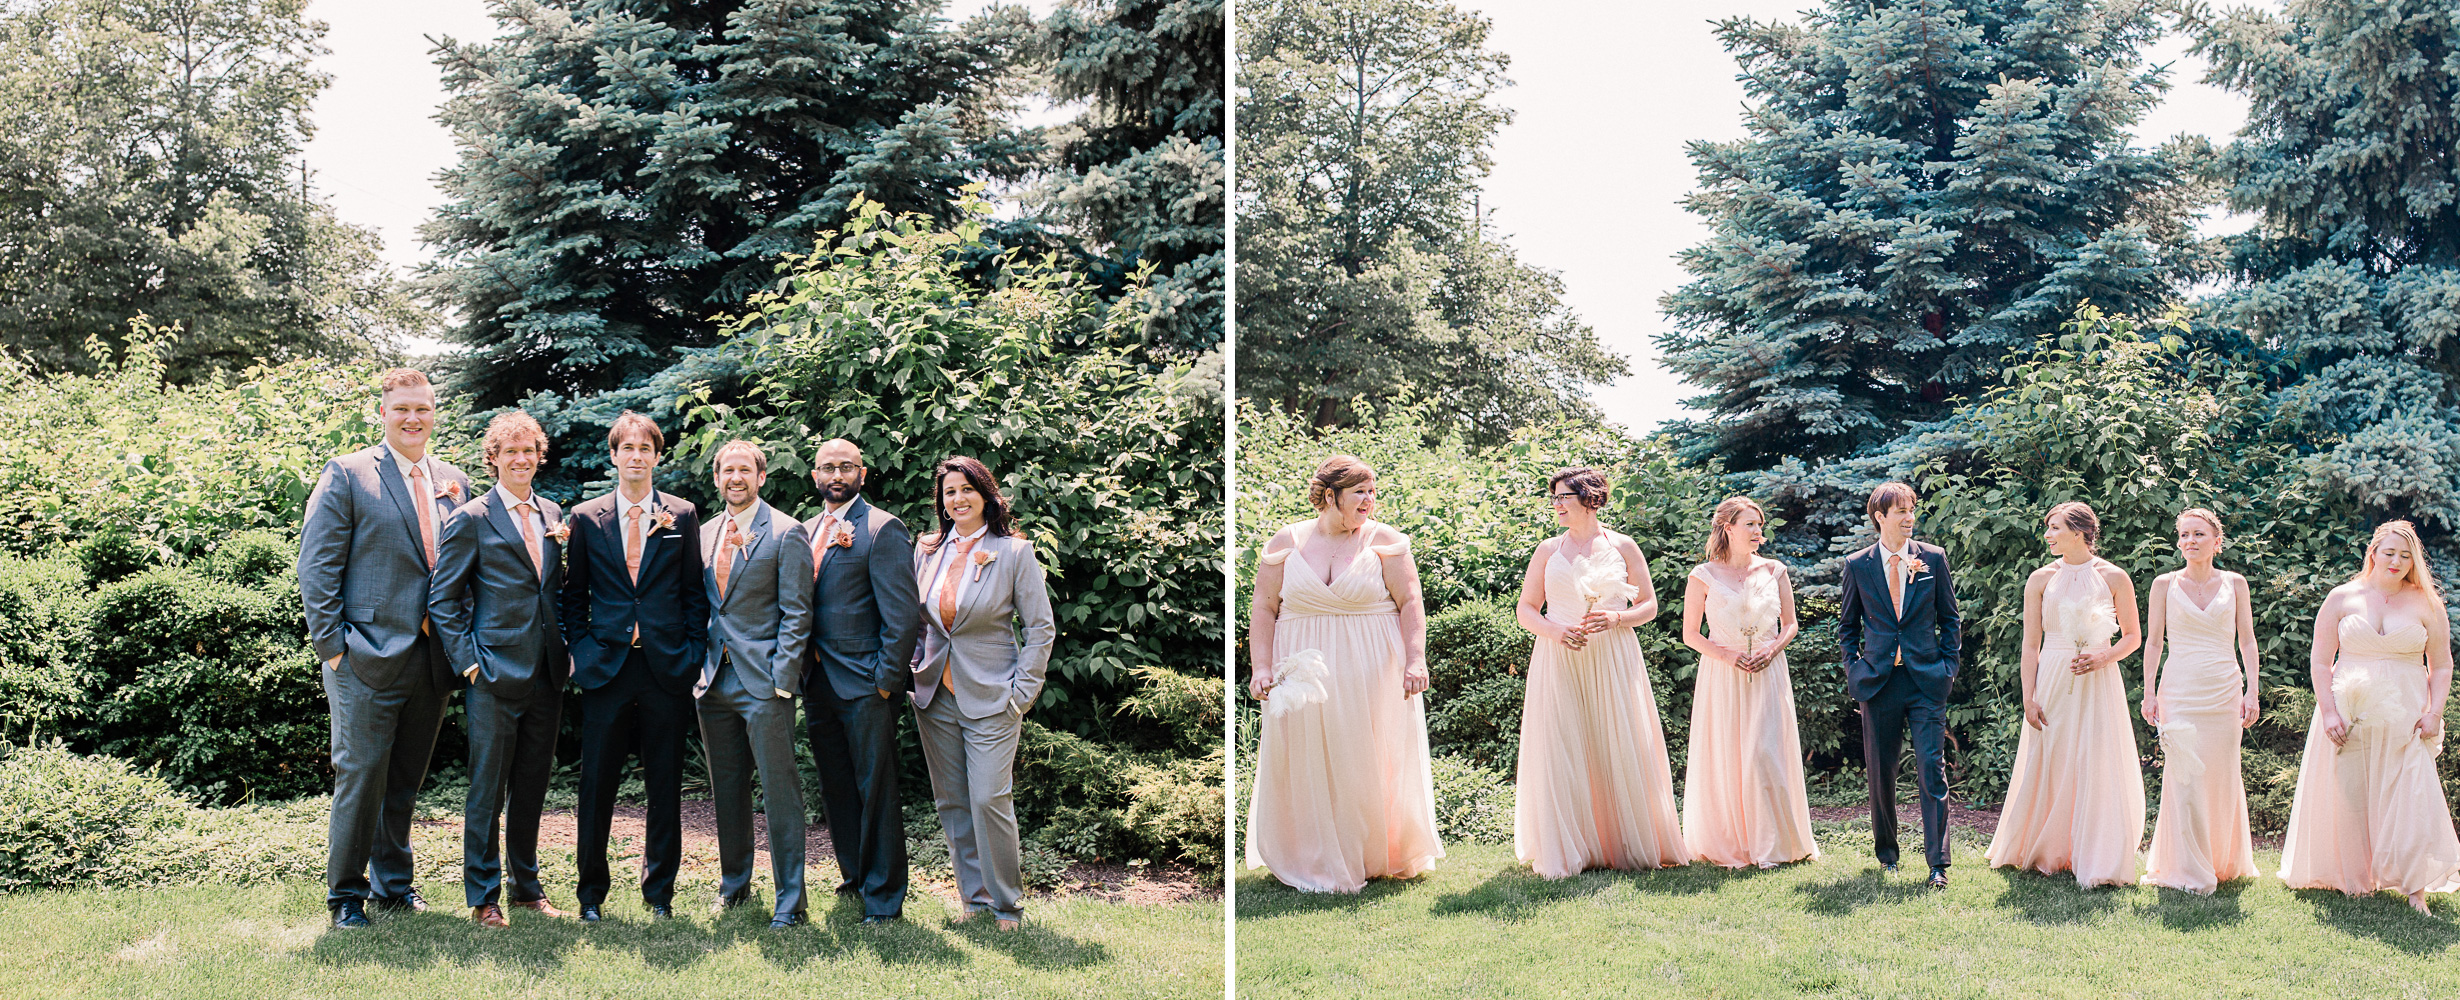 Dorothy_Louise_Photography_University_of_Chicago_Wedding3.jpg